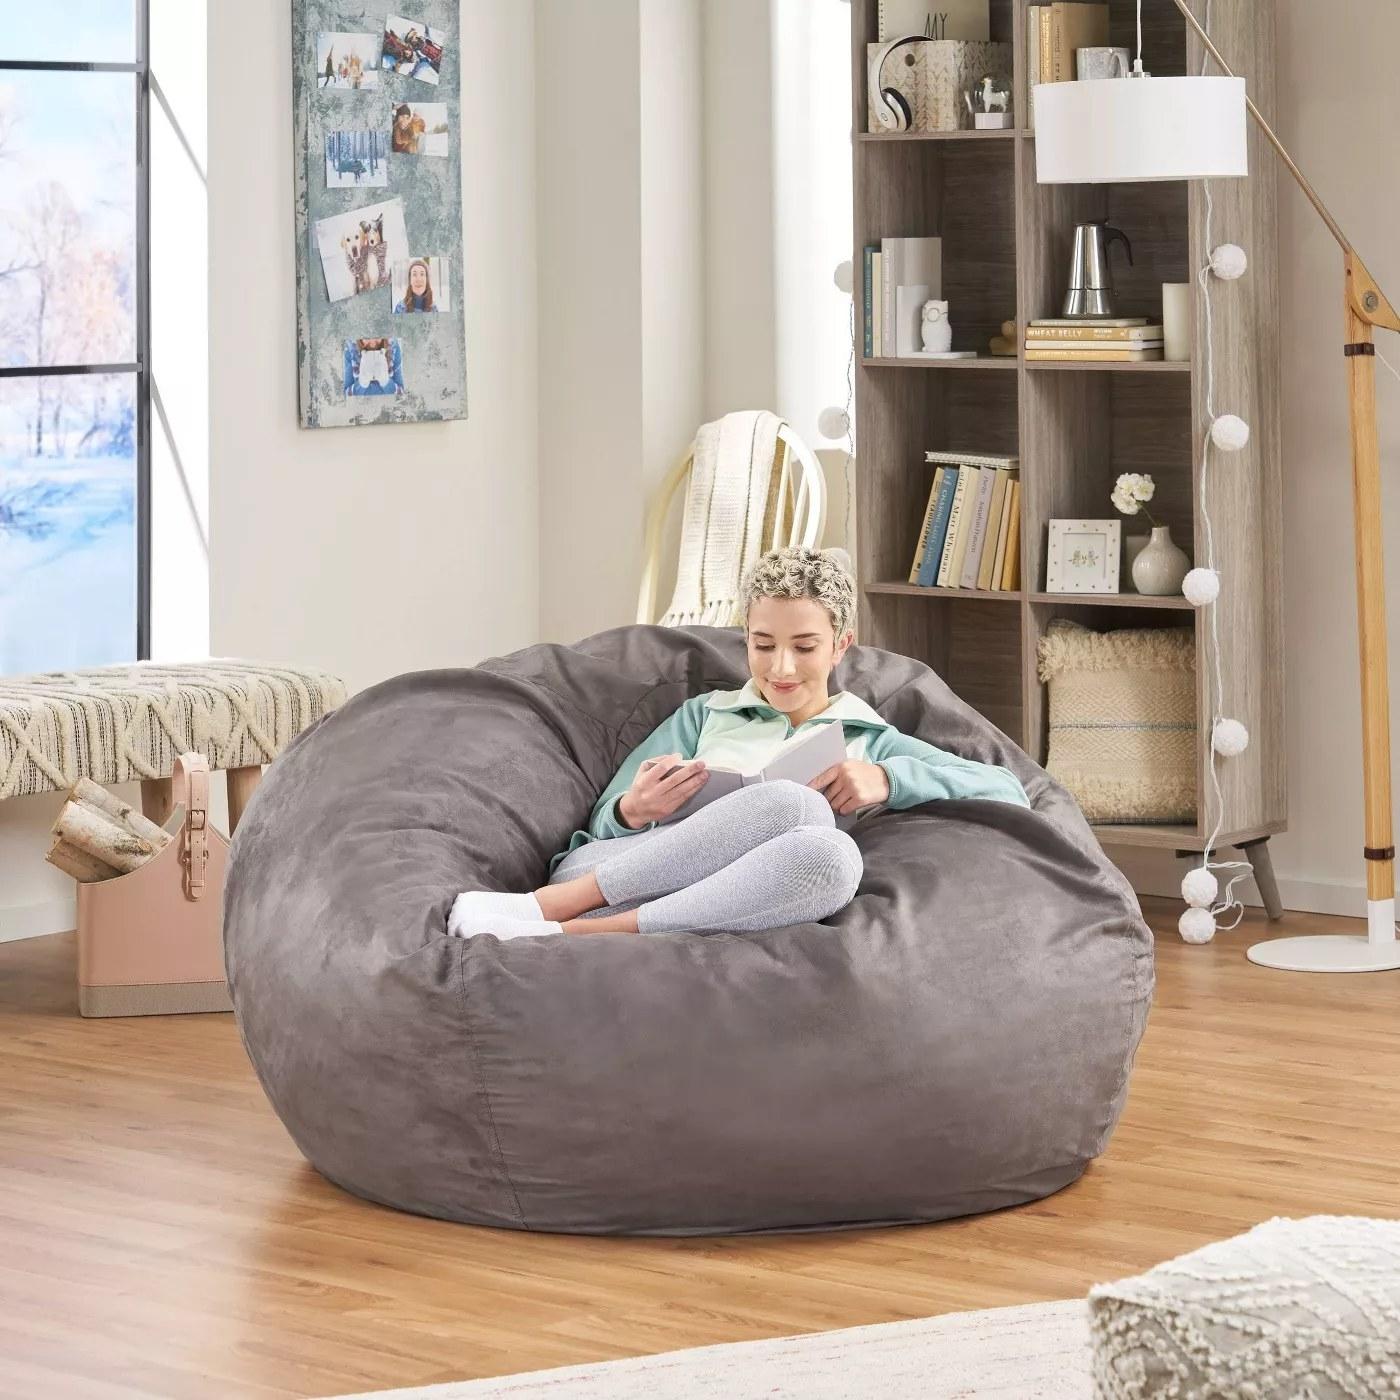 The charcoal beanbag